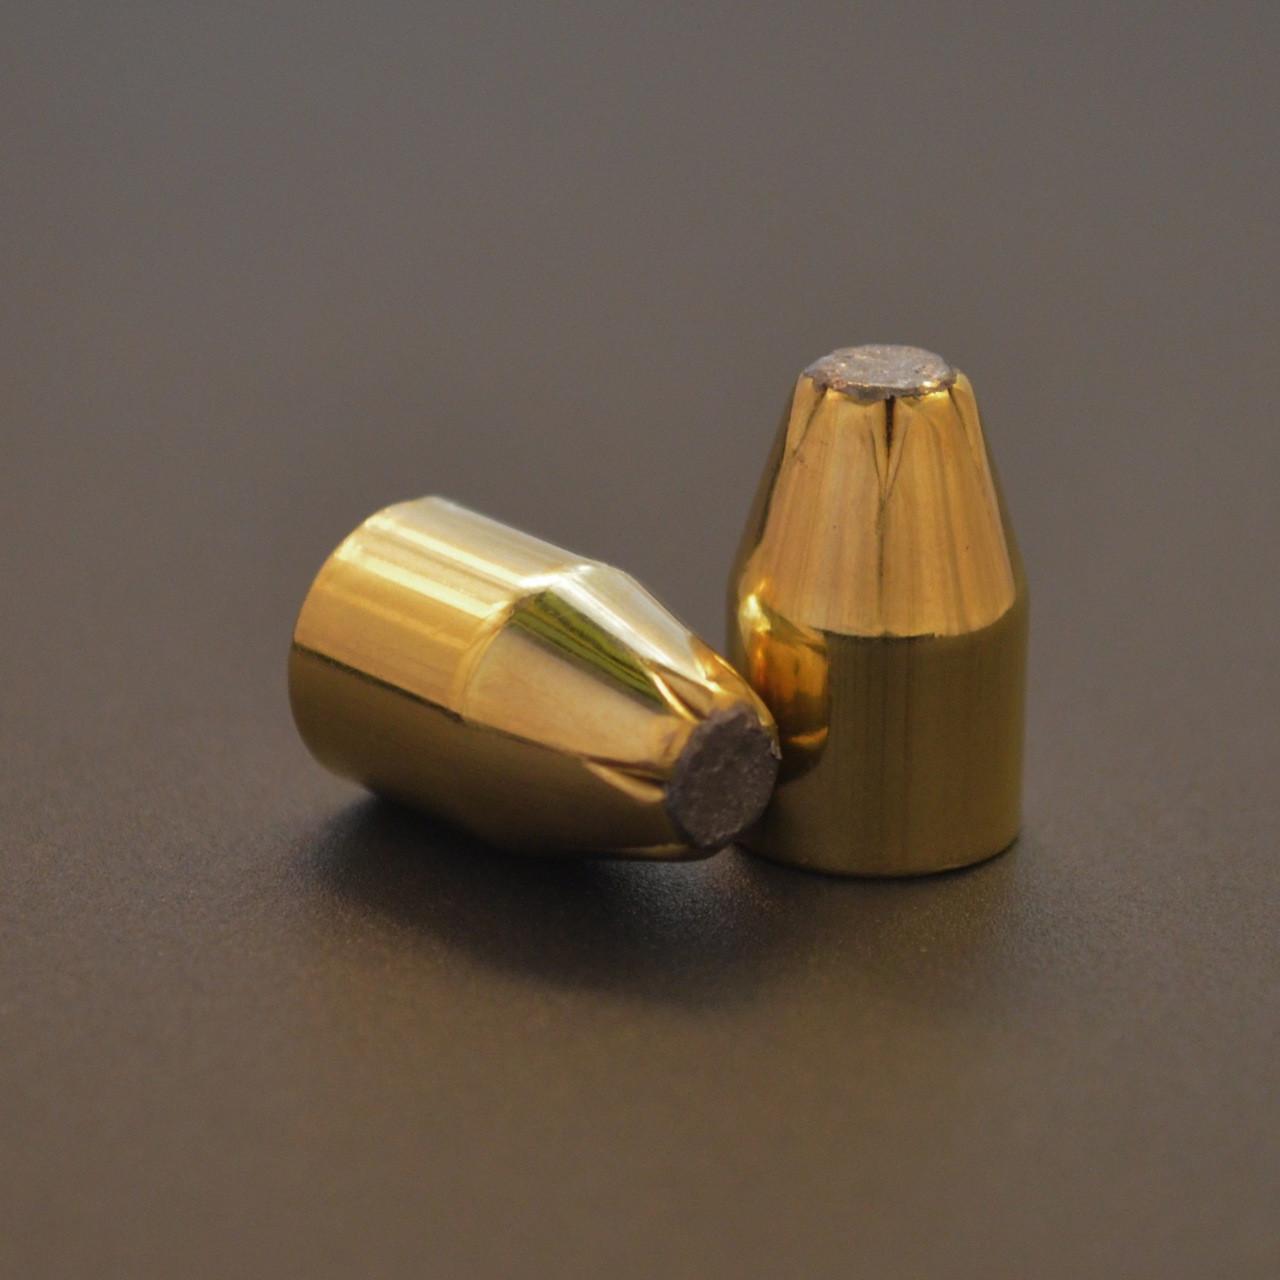 9mm/121gr IFP - 1,000ct